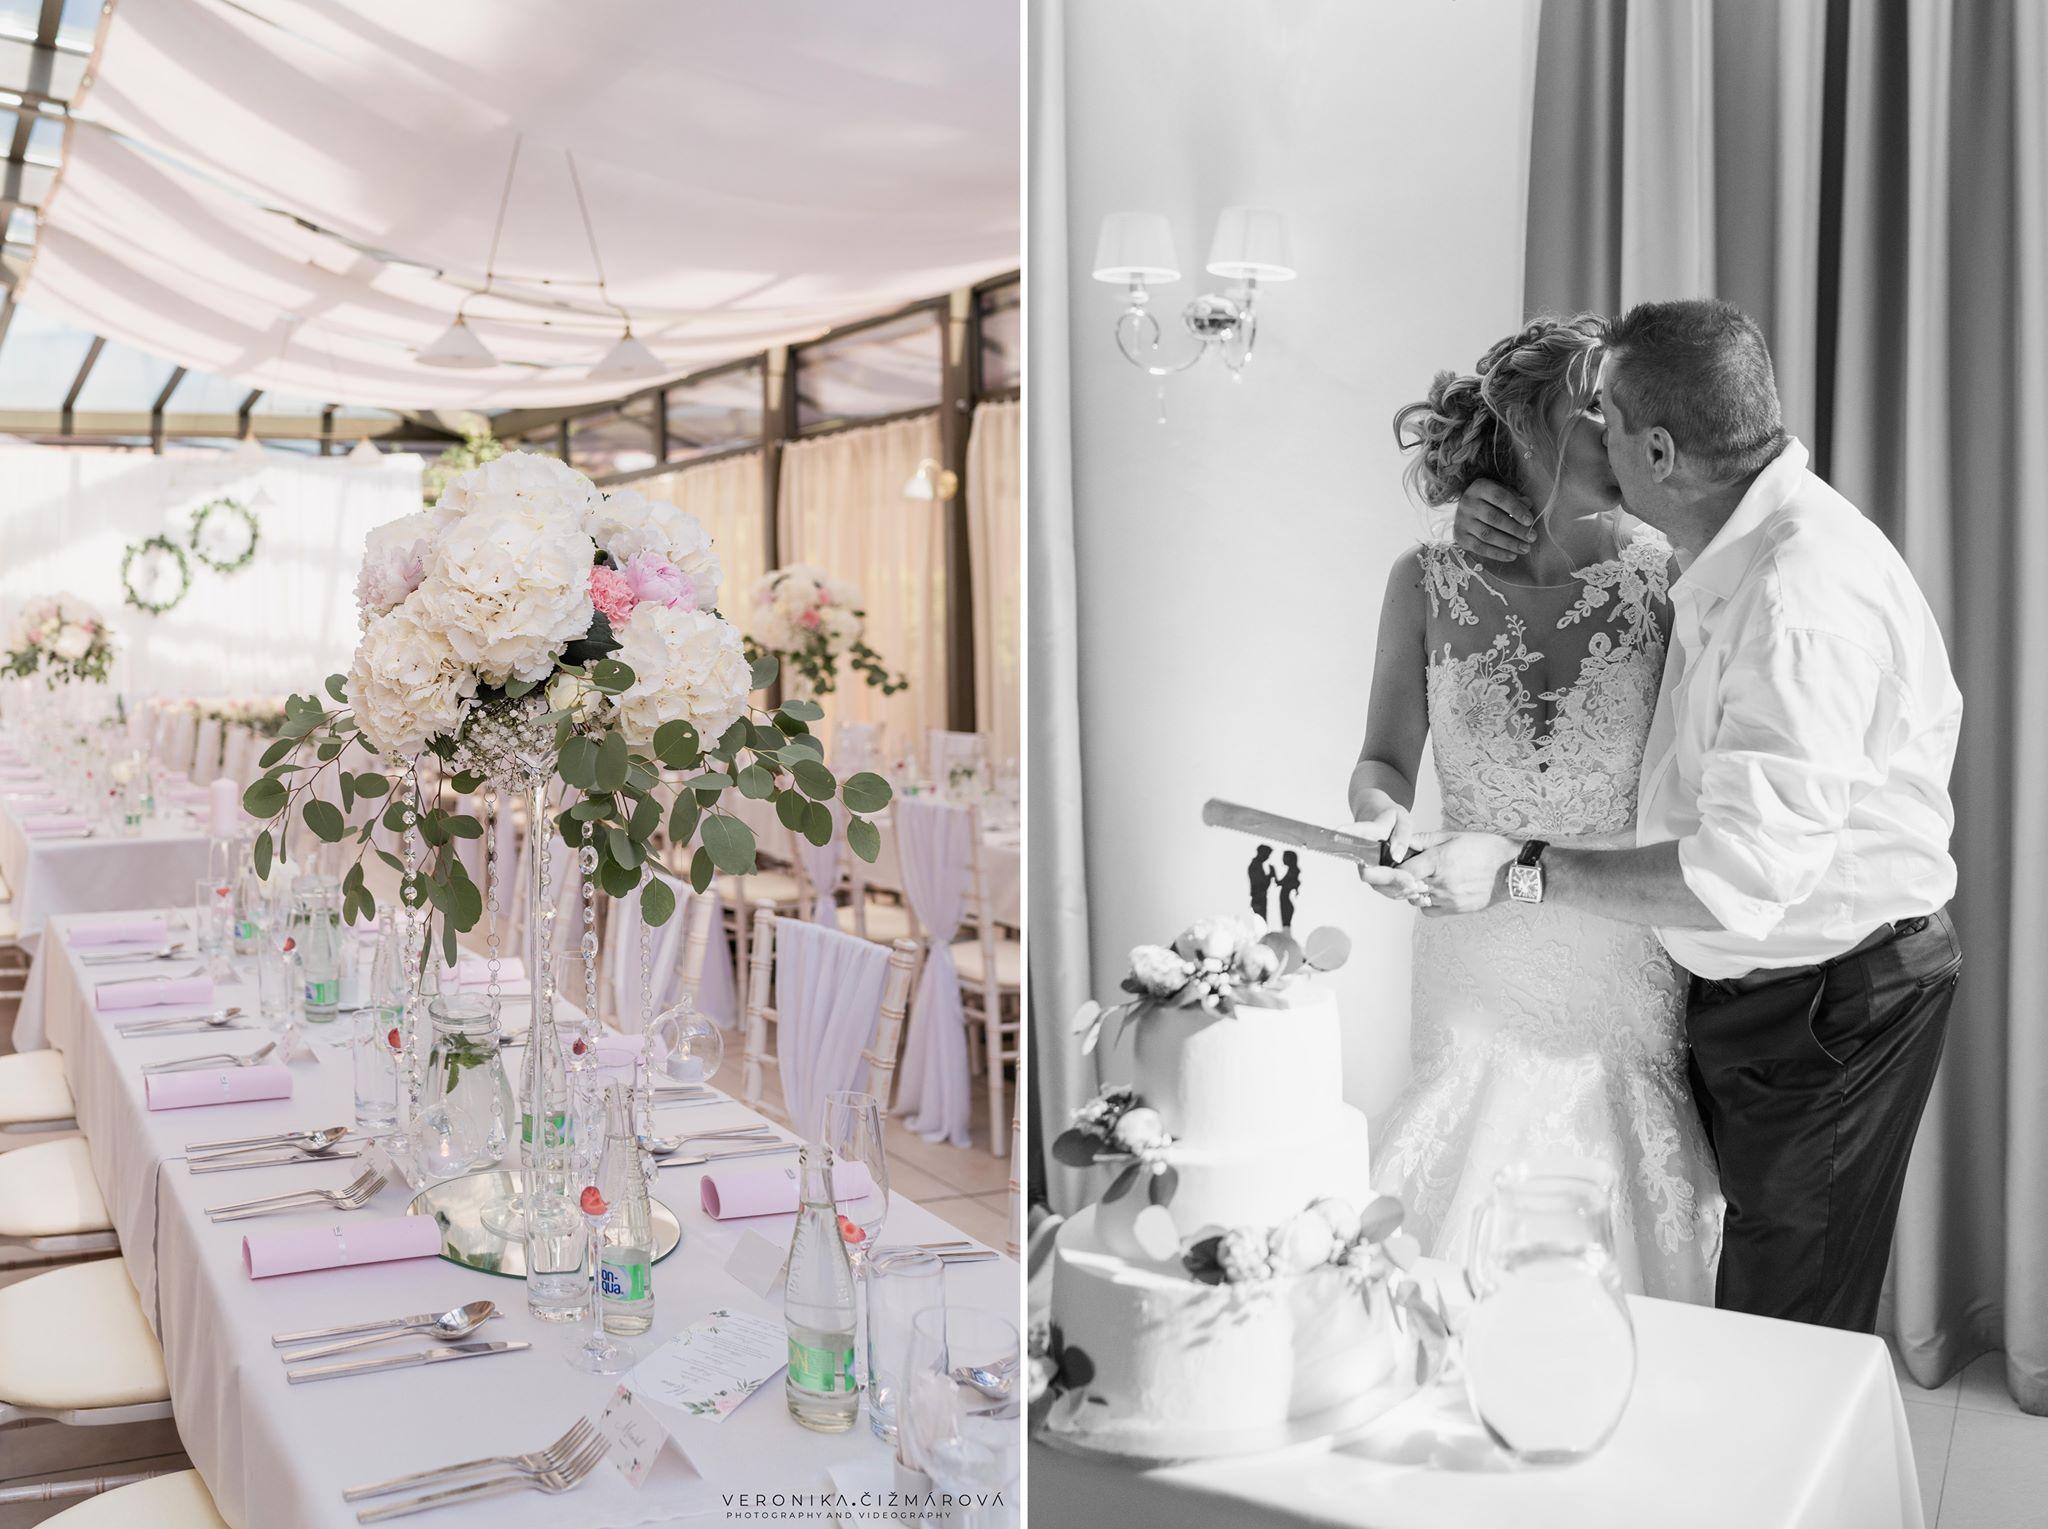 svadba-zilina-krajanie-torty-program-na-svadbu-djjpg